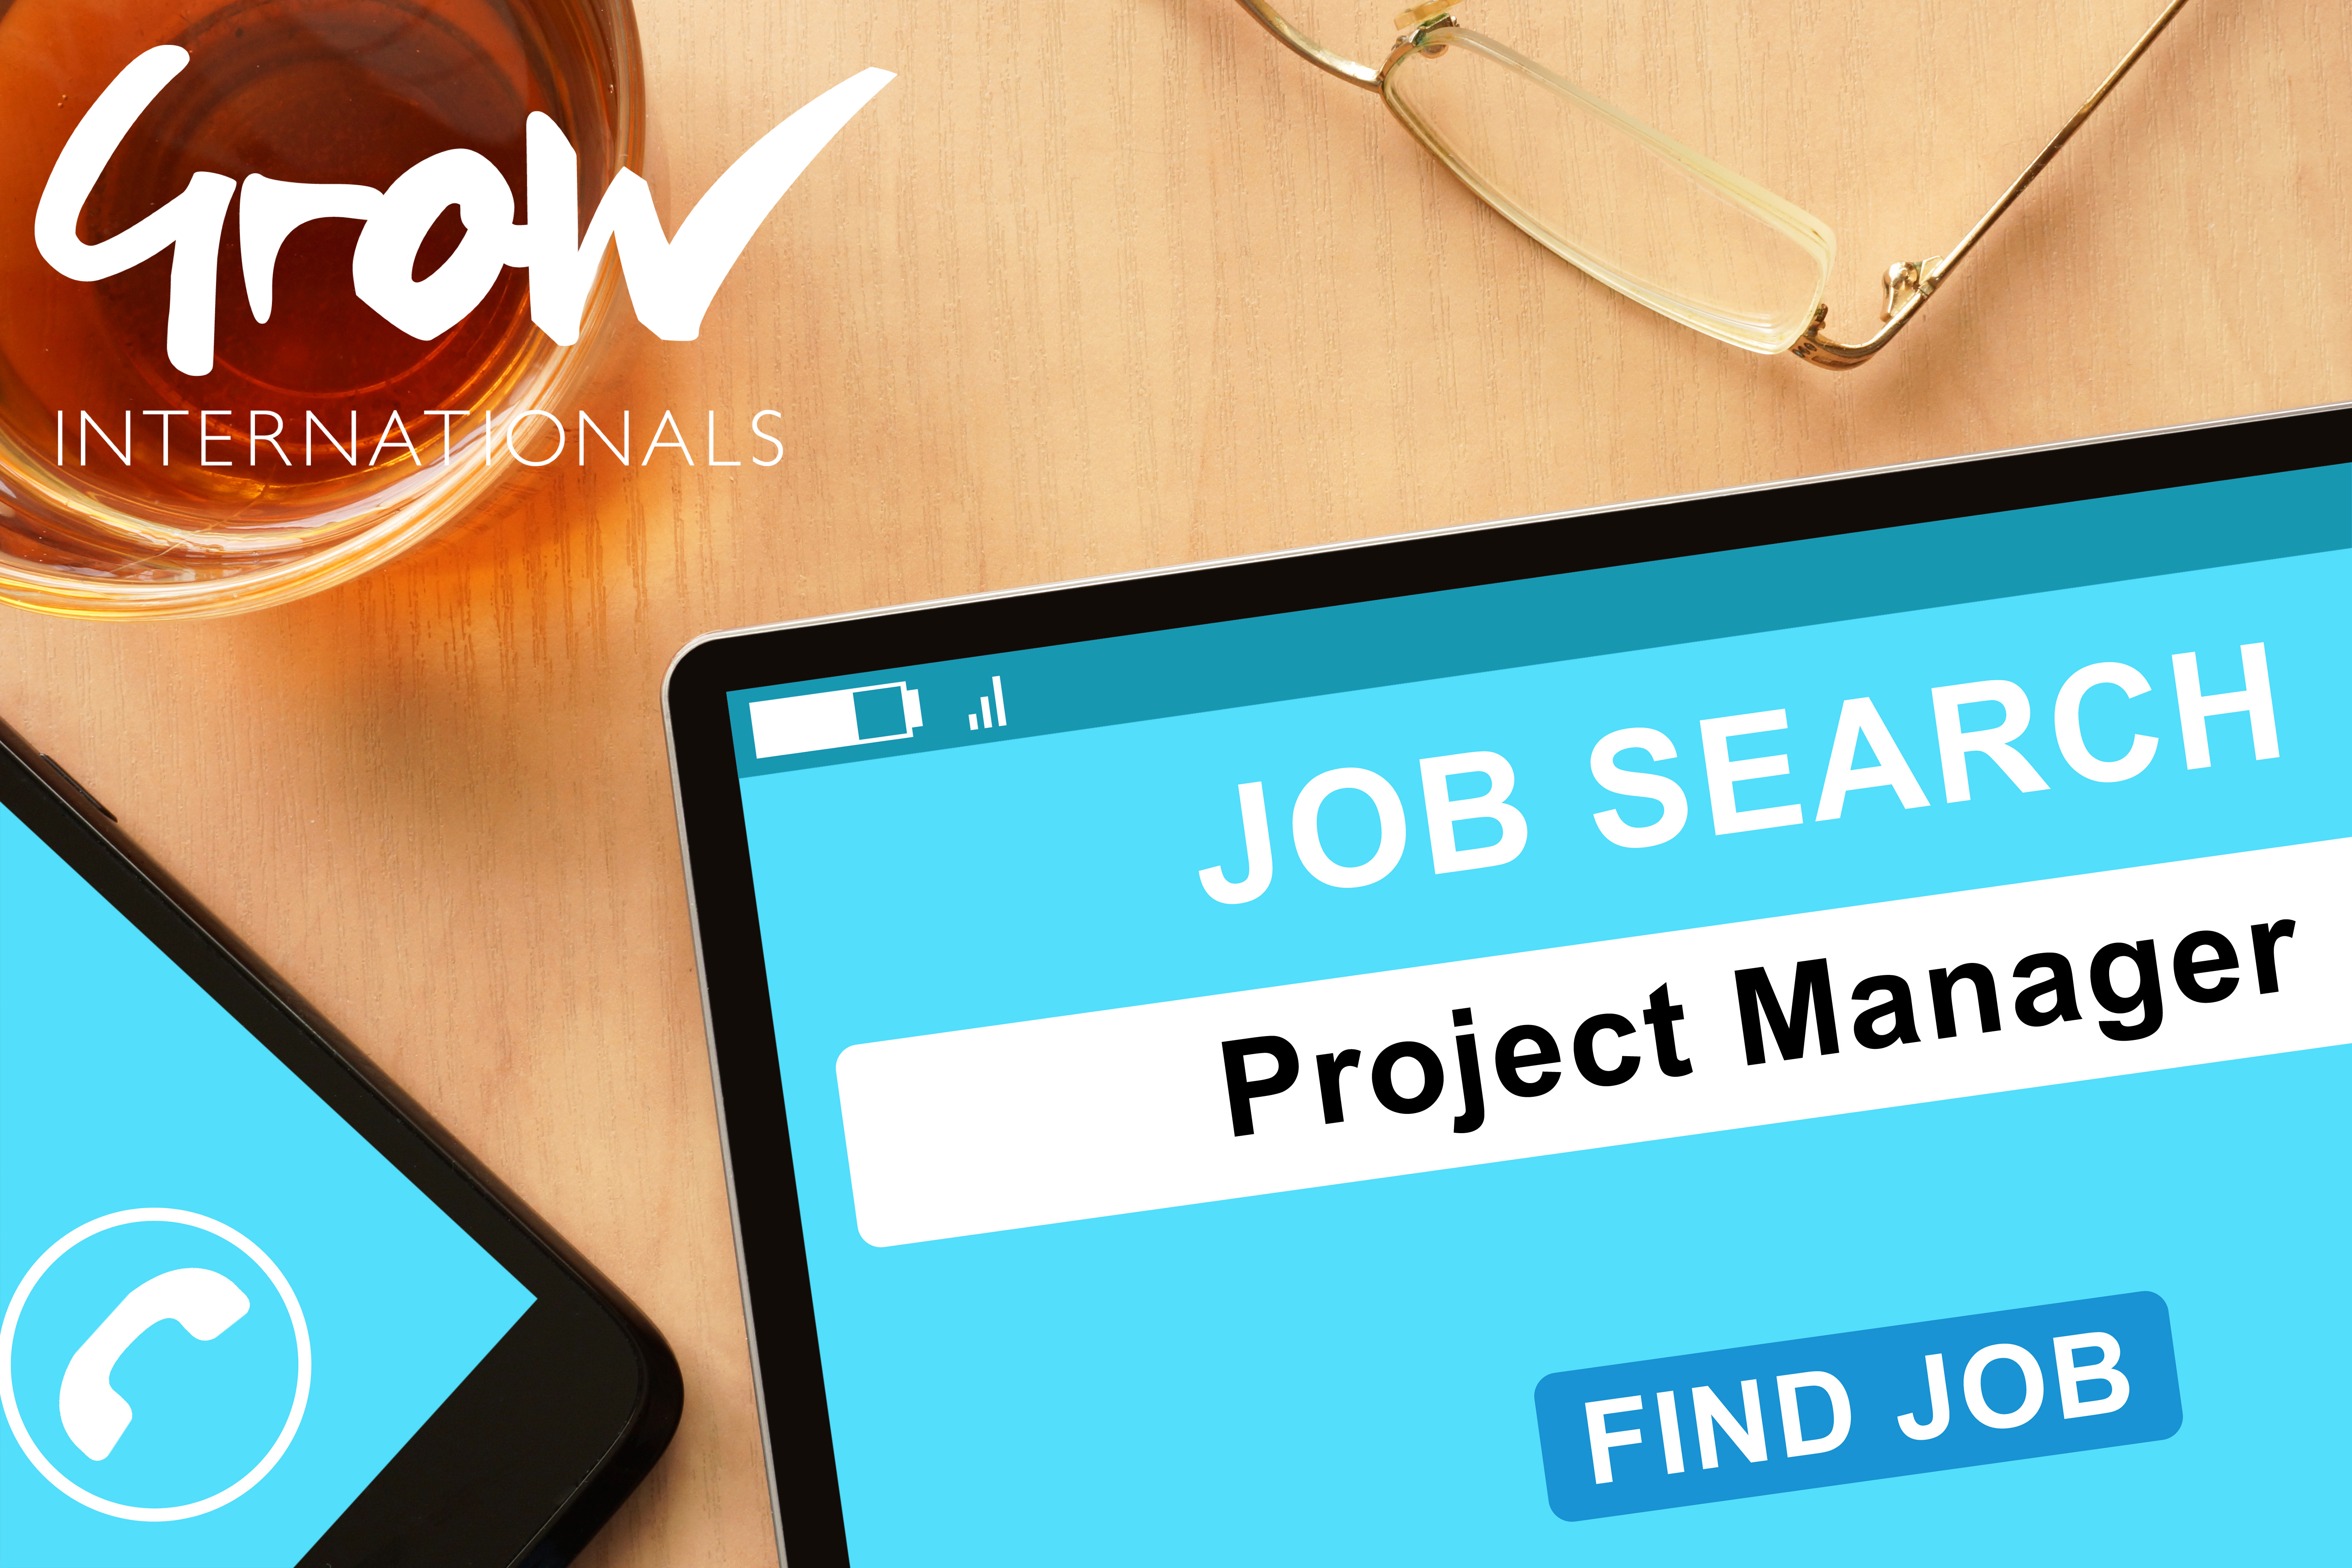 Find a job in Sweden